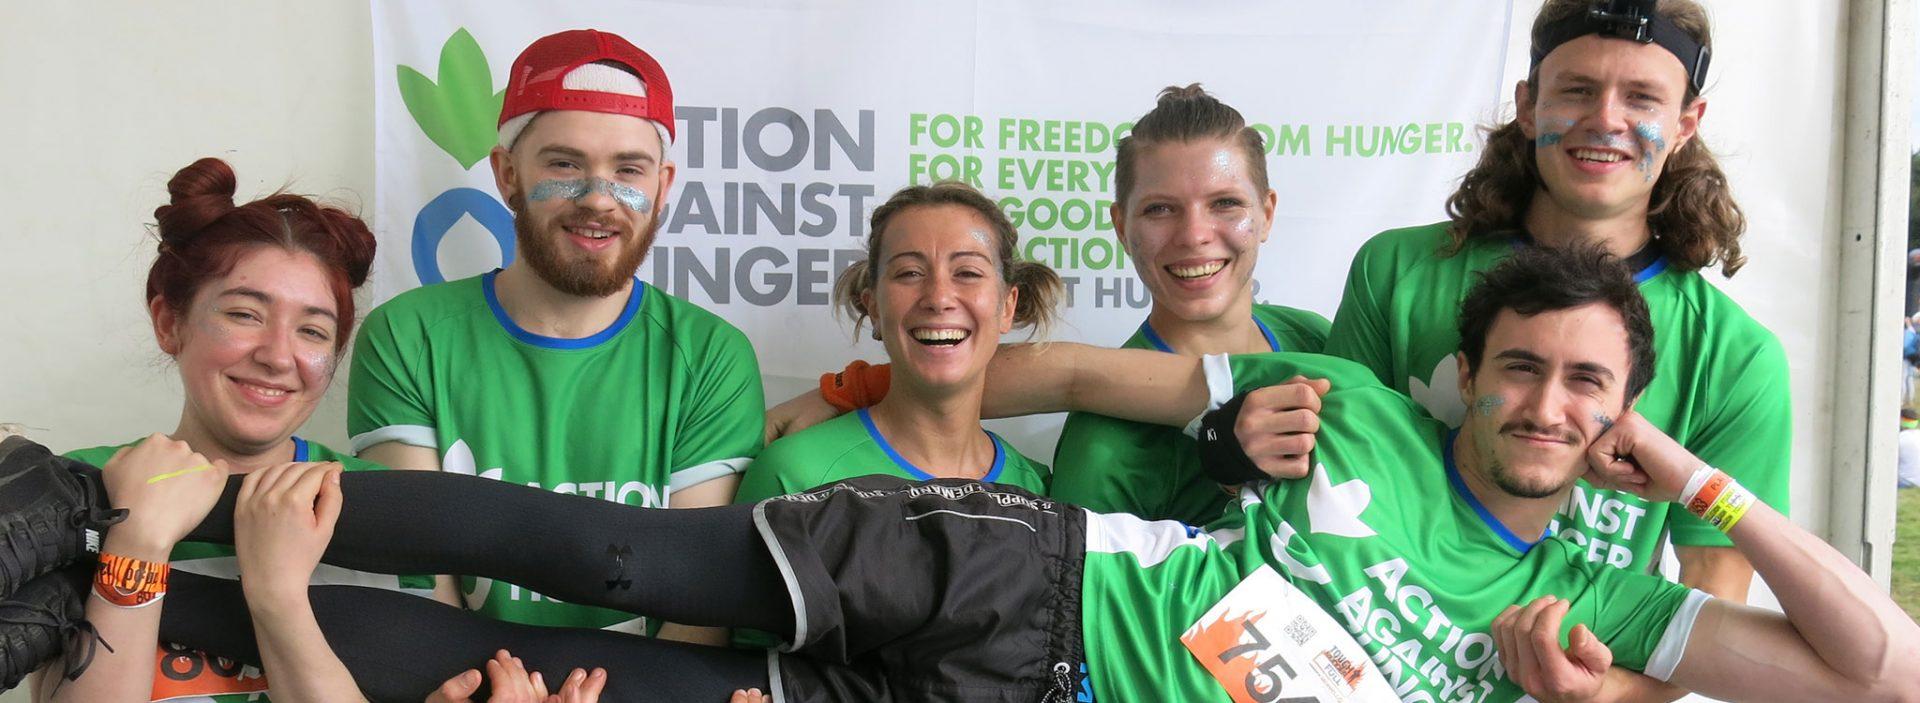 Action Against Hunger tough mudder team